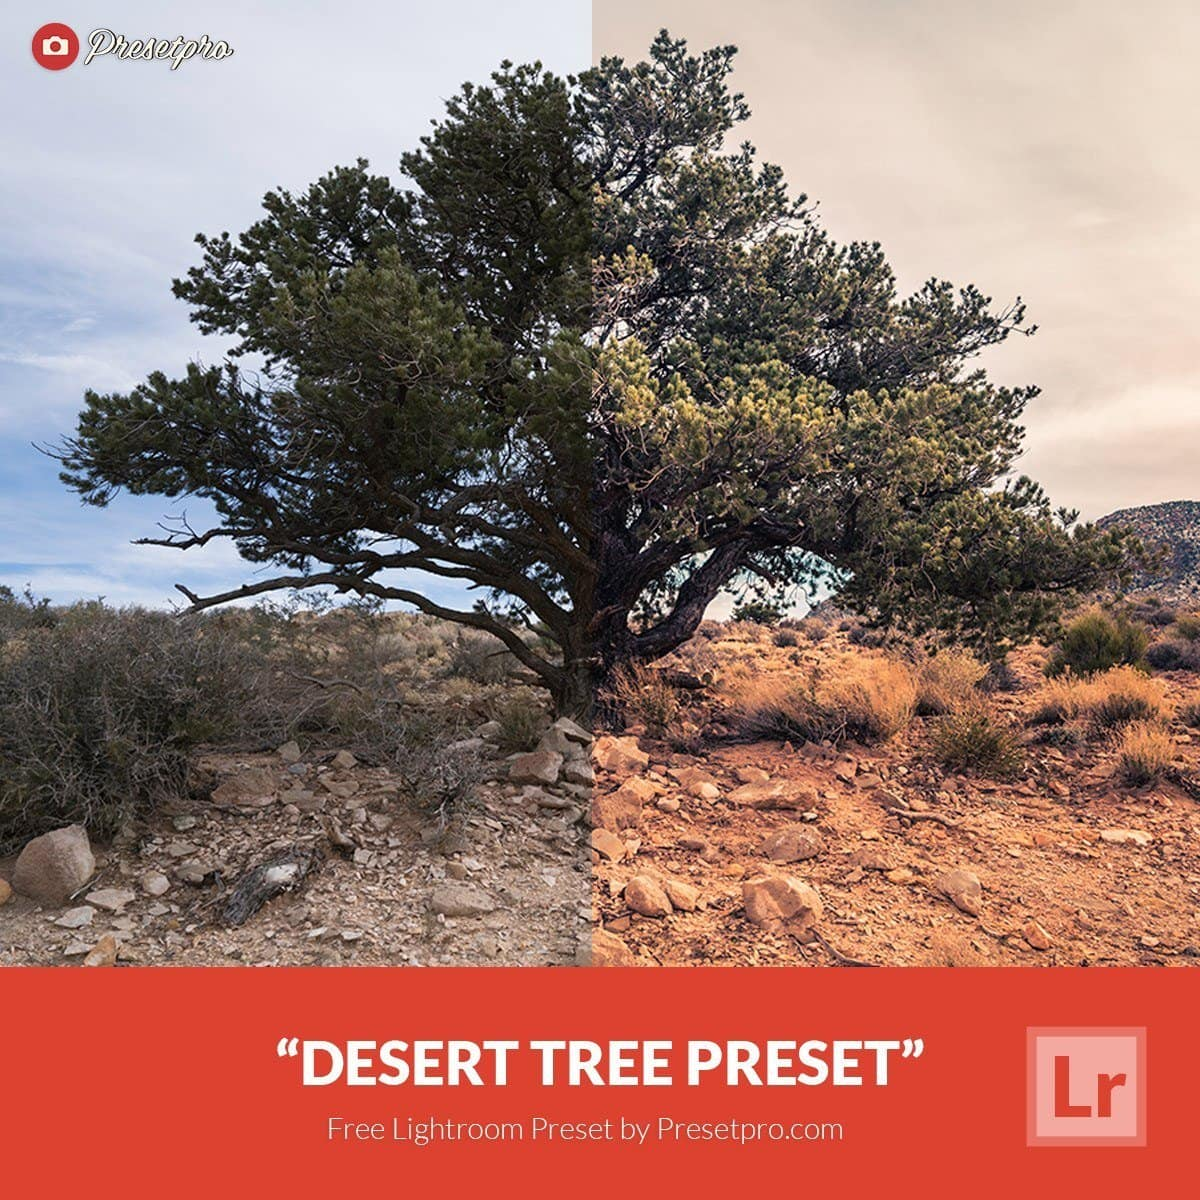 Free-Lightroom-Preset-Desert-Tree